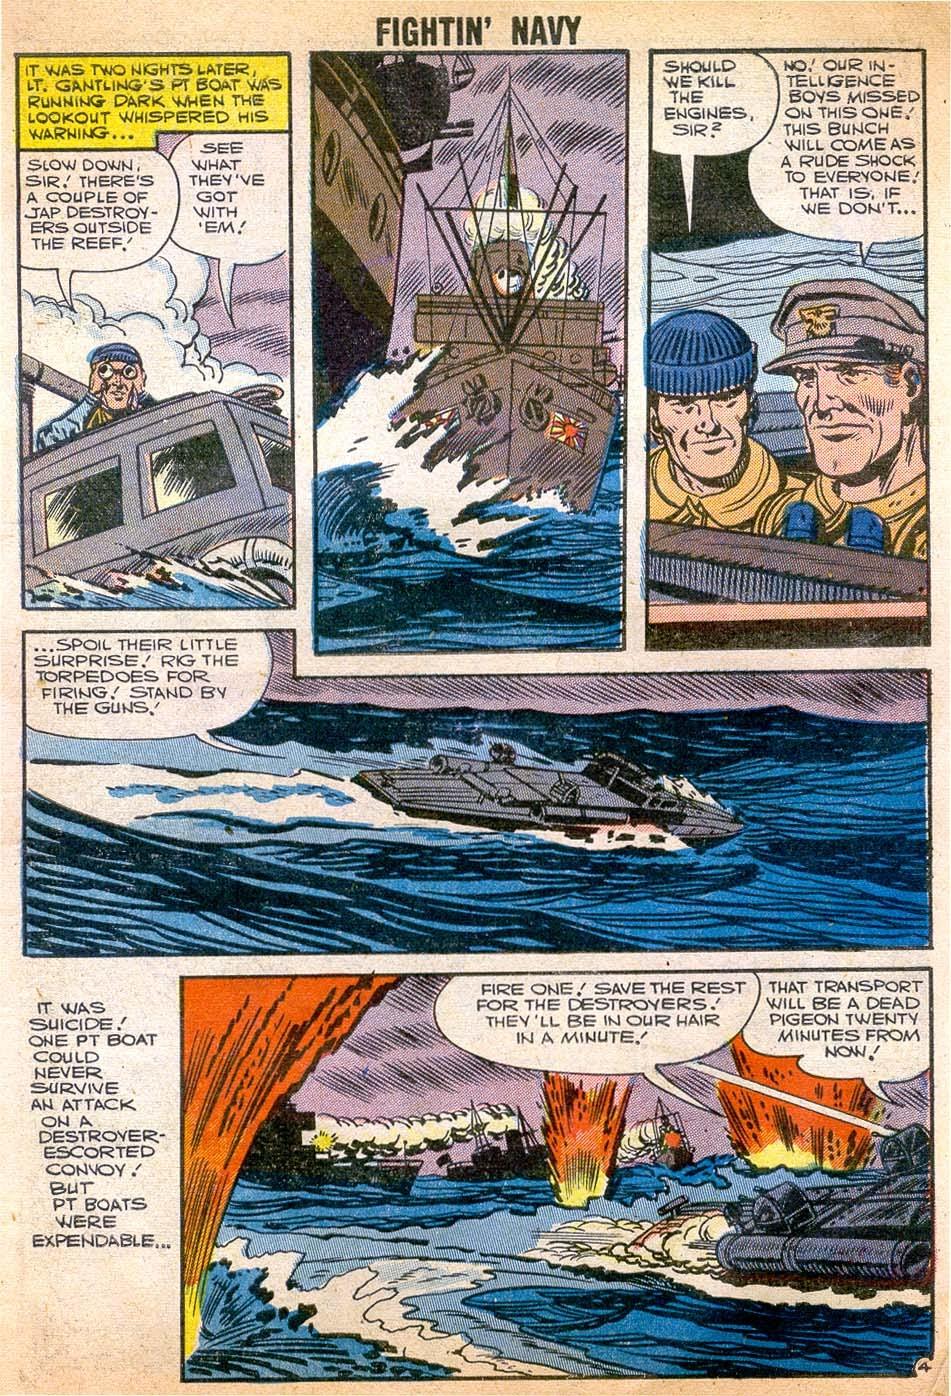 Read online Fightin' Navy comic -  Issue #79 - 7